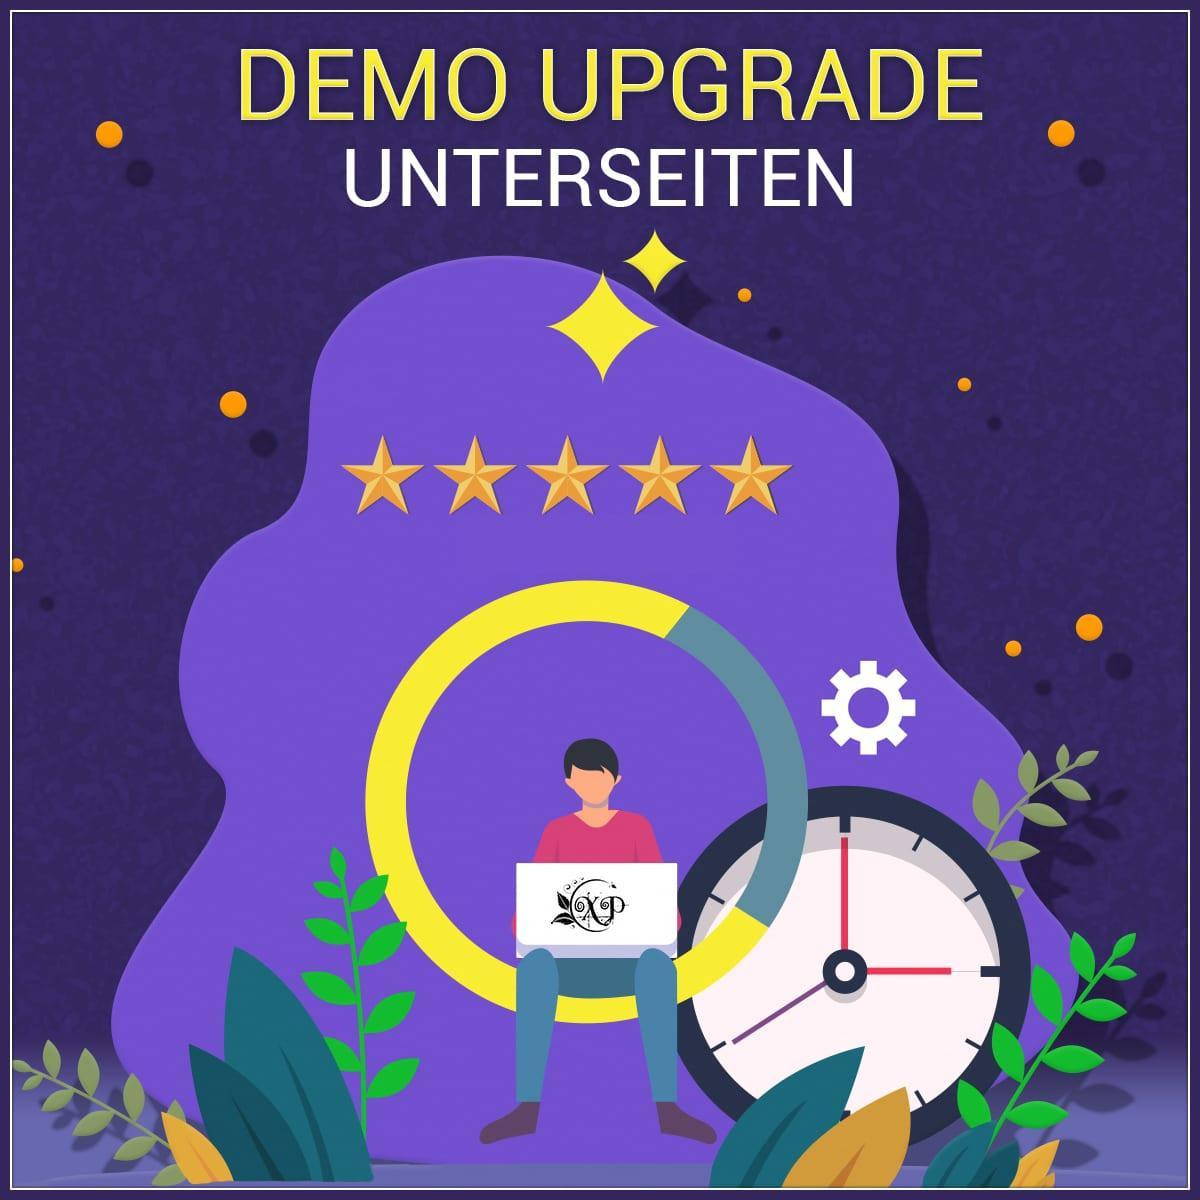 Demo Upgrade Unterseiten Thumbnail neu